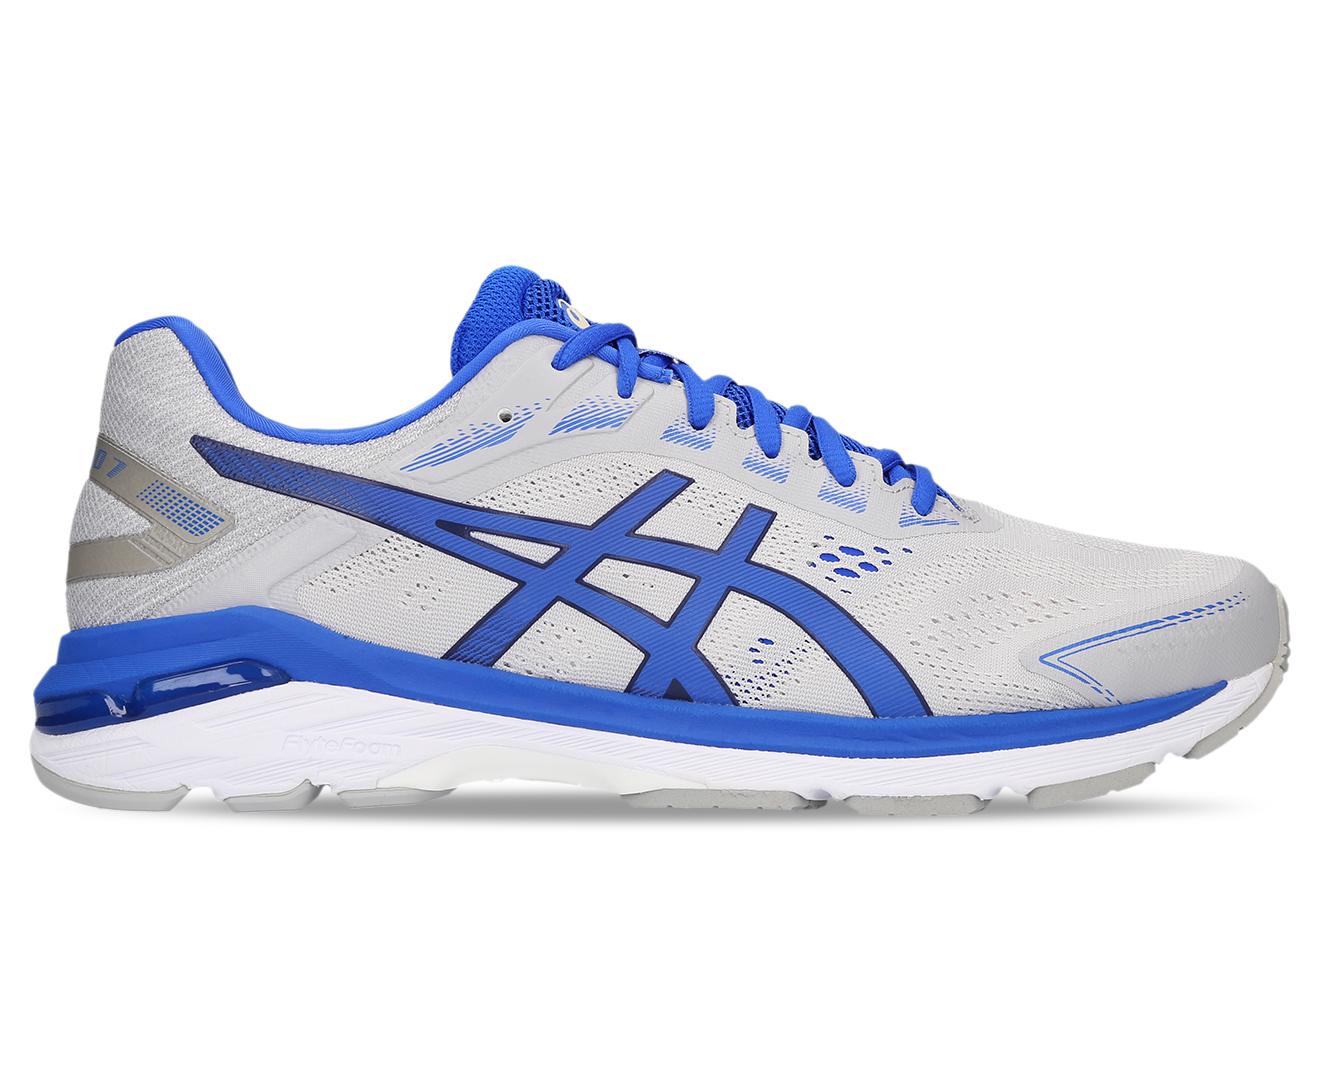 Details about ASICS Men\u0027s GT,2000 7 Lite,Show Running Shoes , Mid  Grey/Illusion Blue